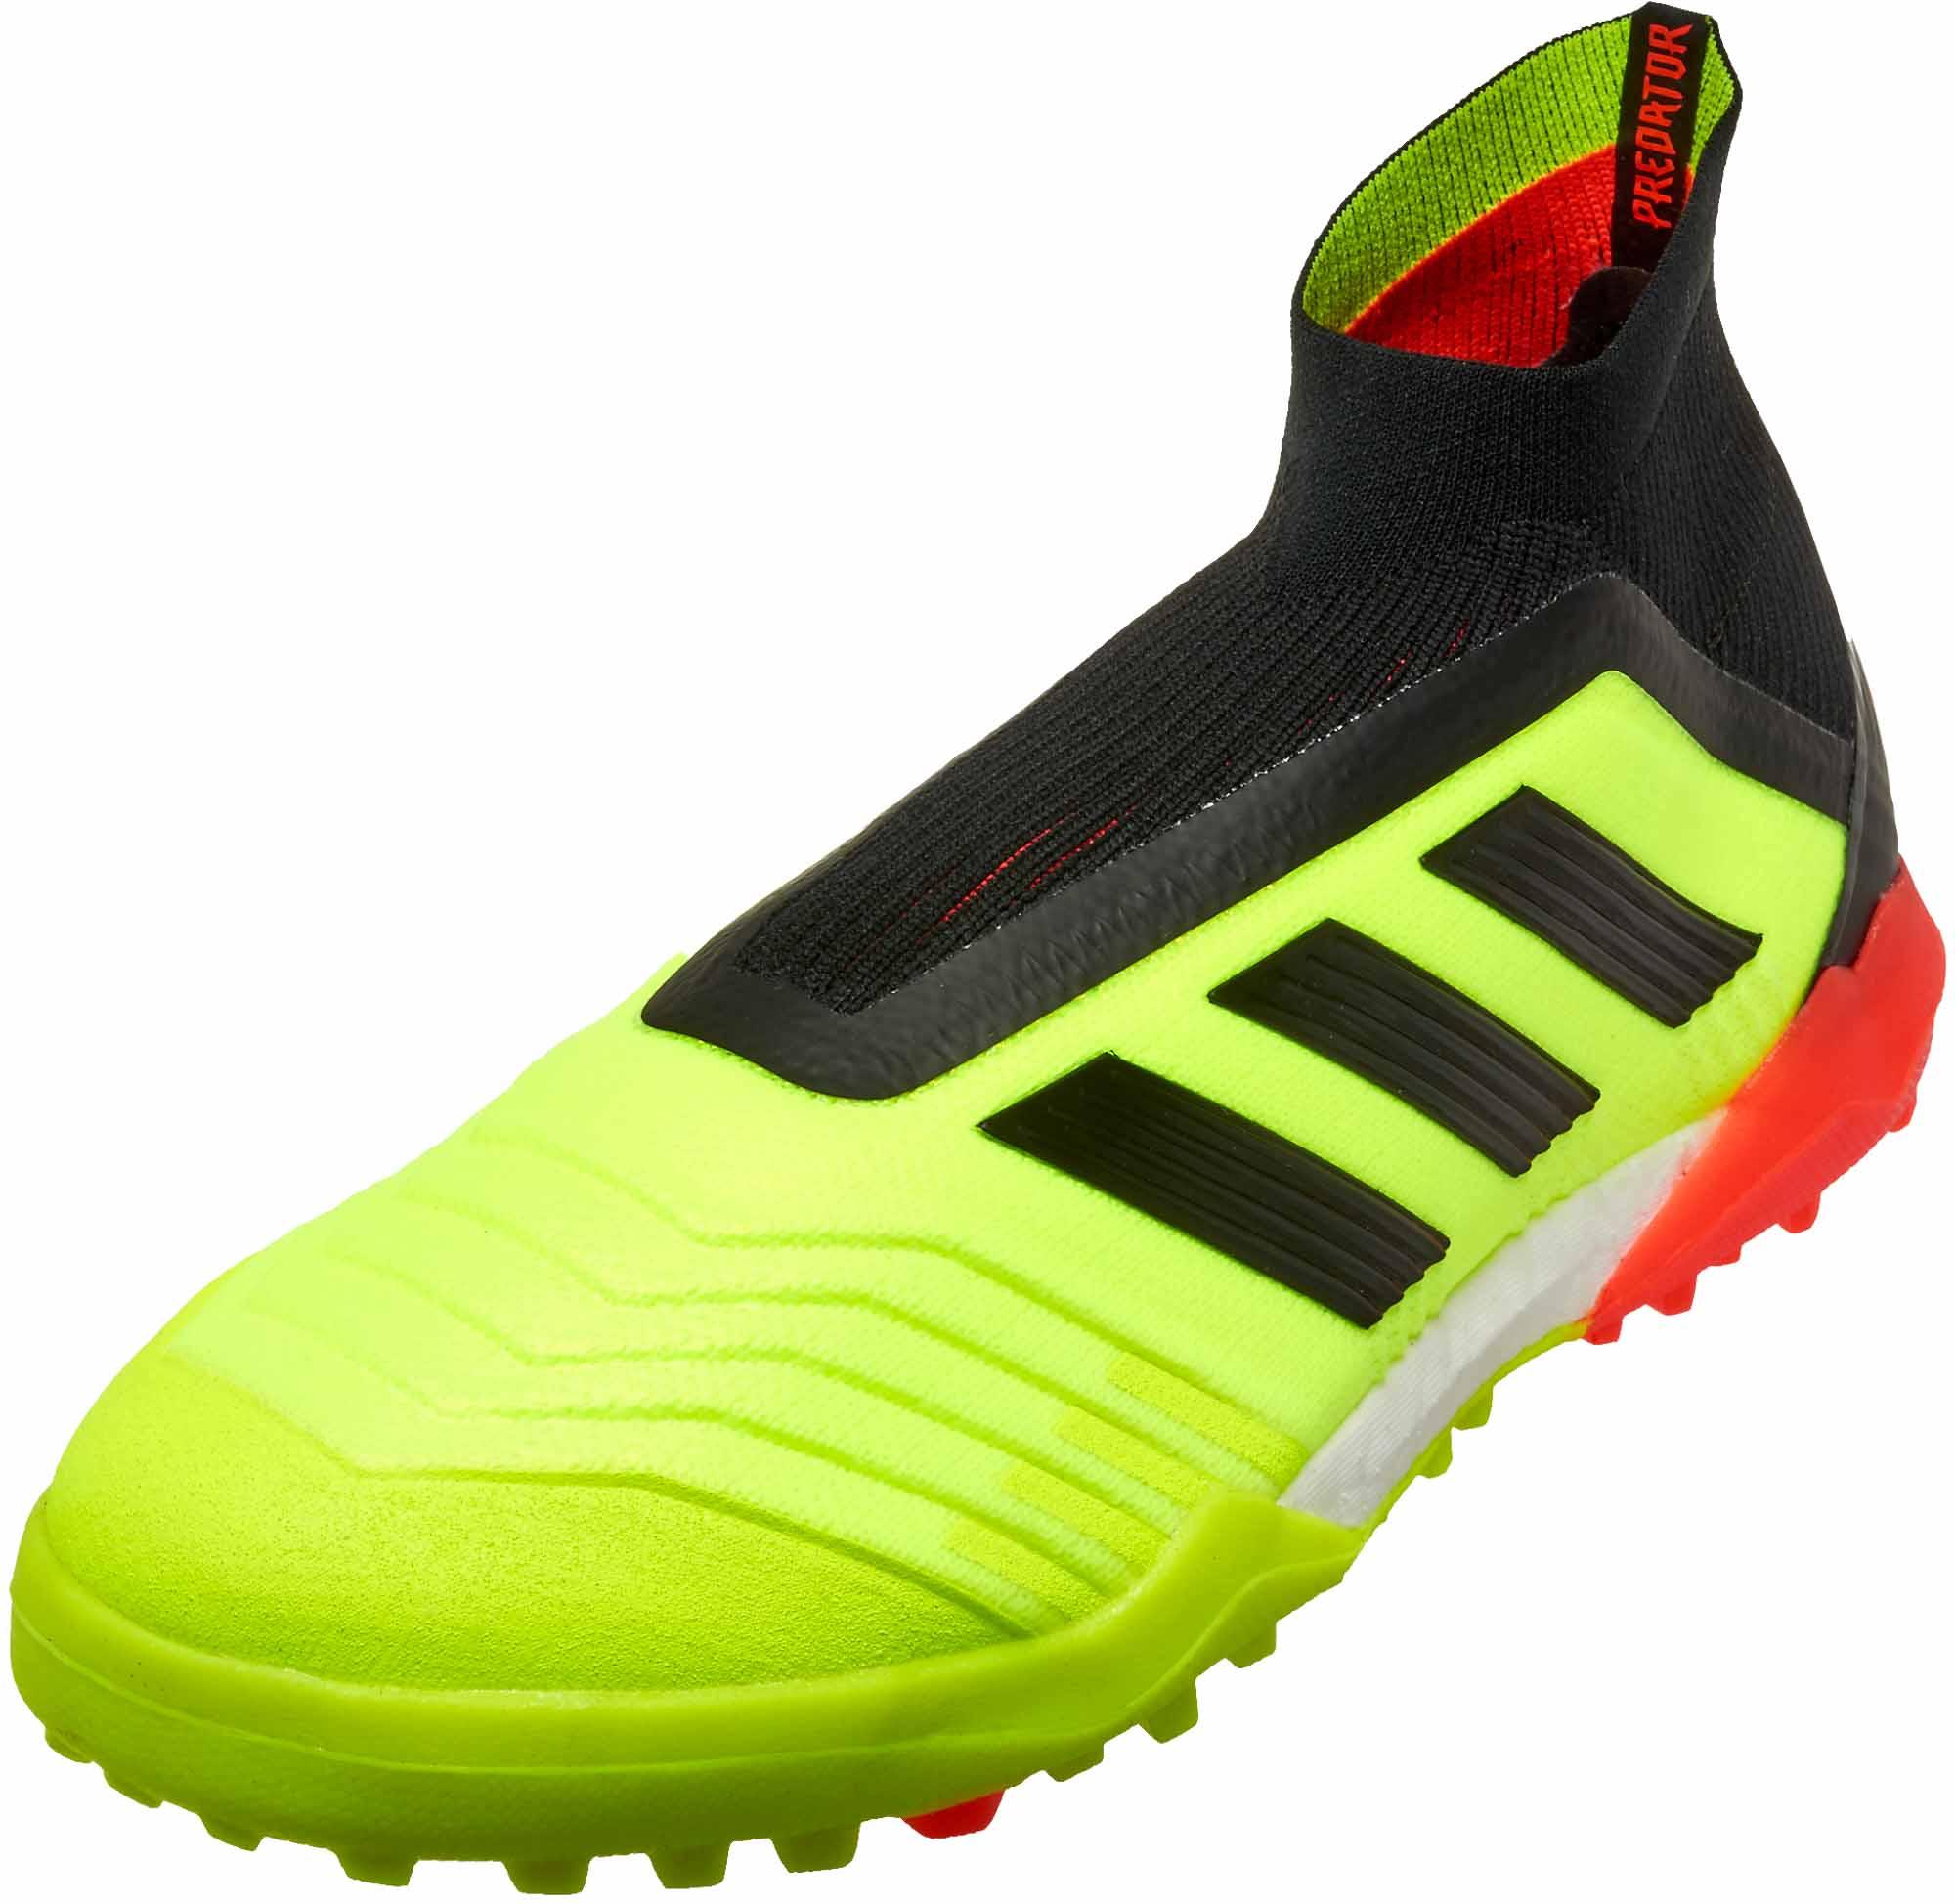 9864fcea229 adidas Predator Tango 18 TF - Solar Yellow Black Solar Red - SoccerPro